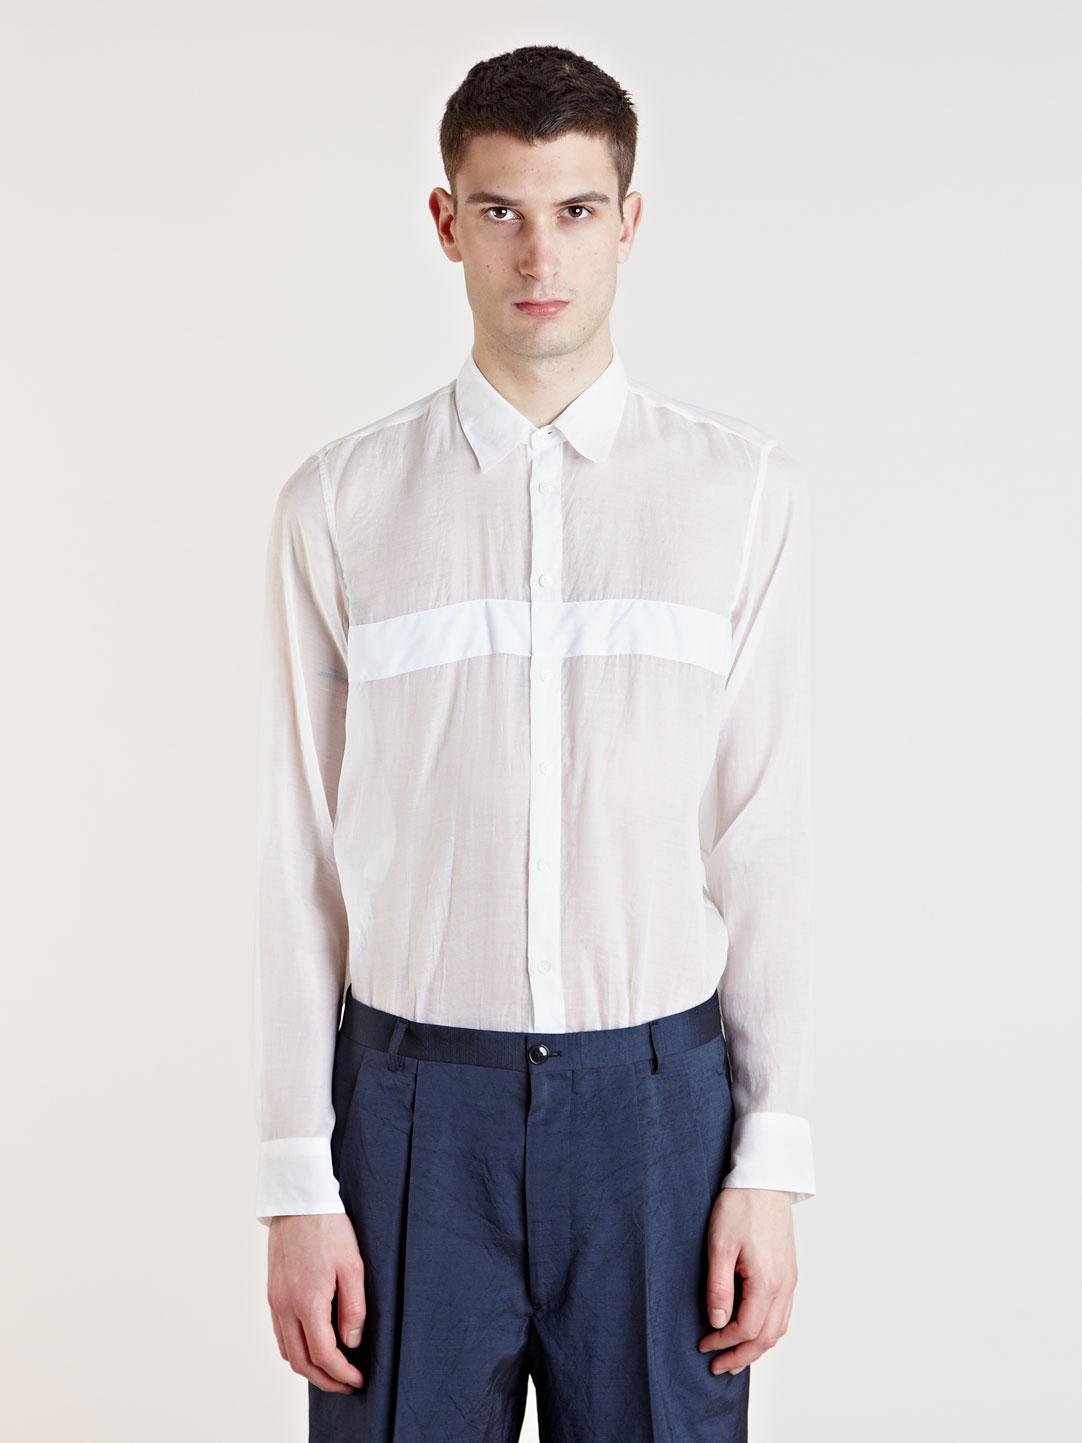 lyst dries van noten campino shirt in white for men